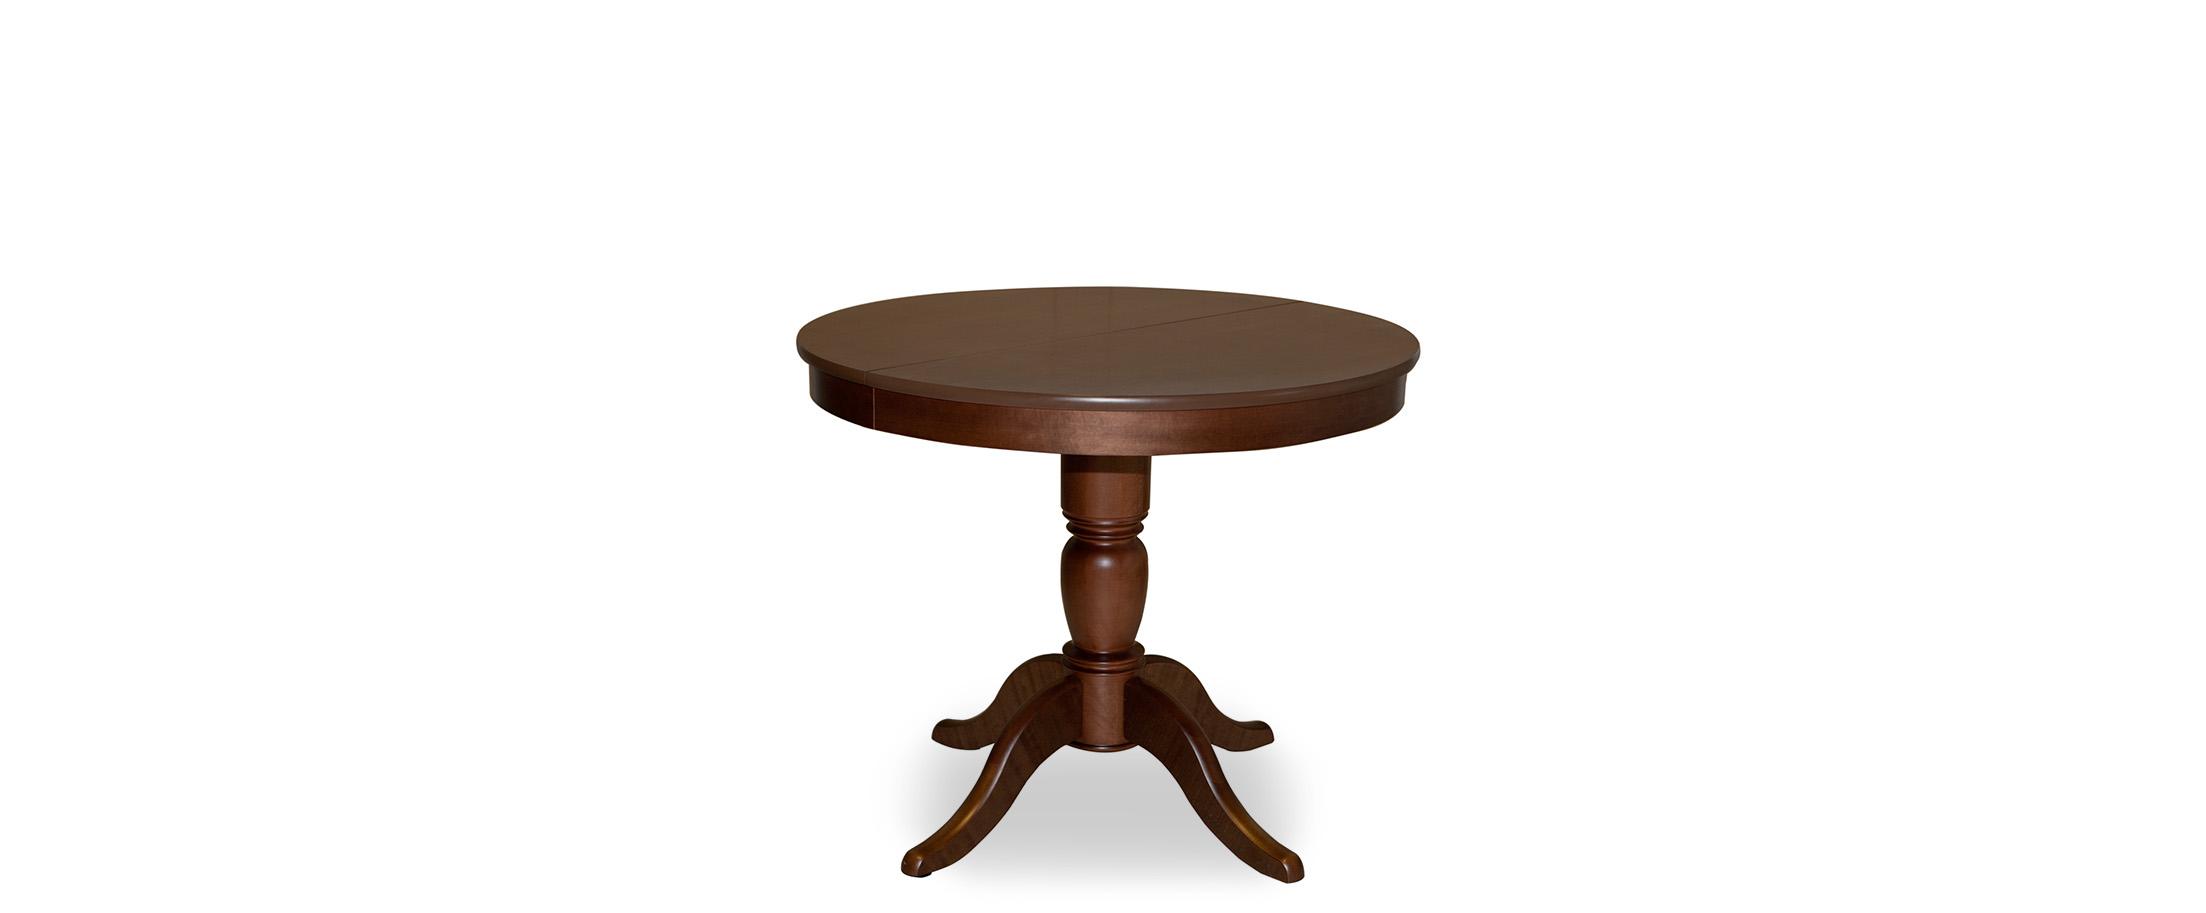 Стол Фламинго 1 Американский орех Модель 370 от MOON TRADE